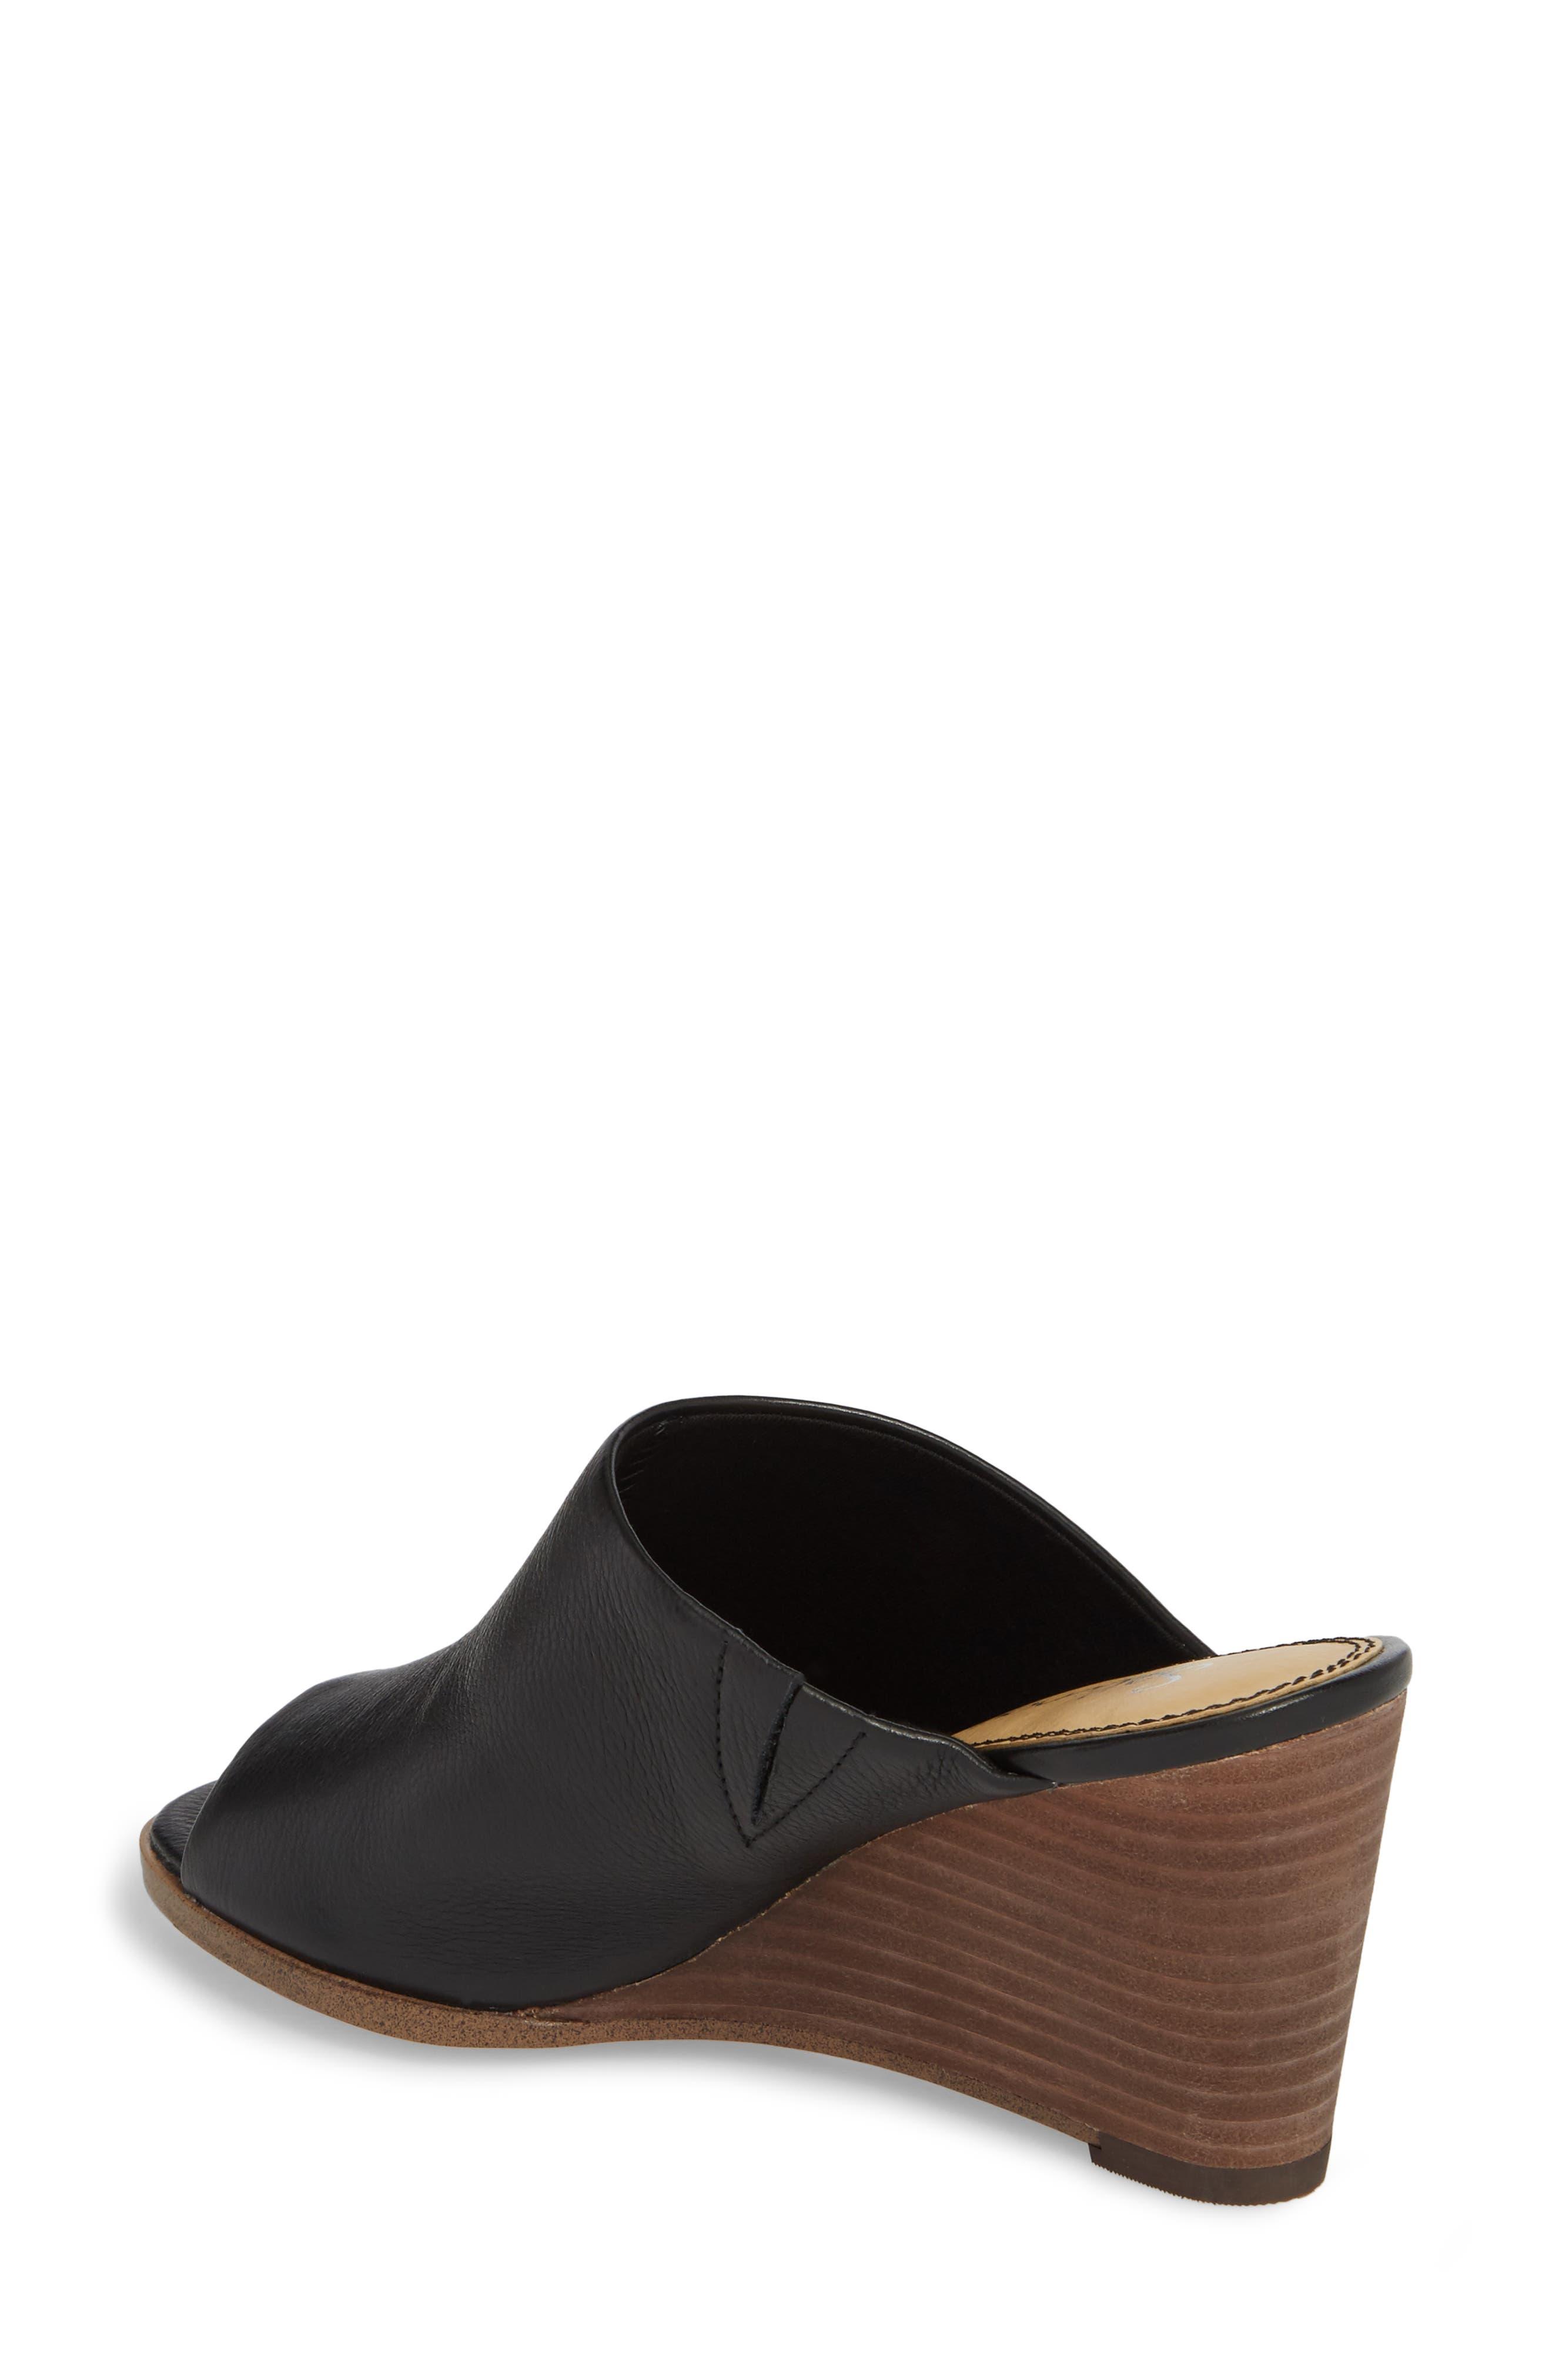 Fenwick Wedge Sandal,                             Alternate thumbnail 2, color,                             Black Leather